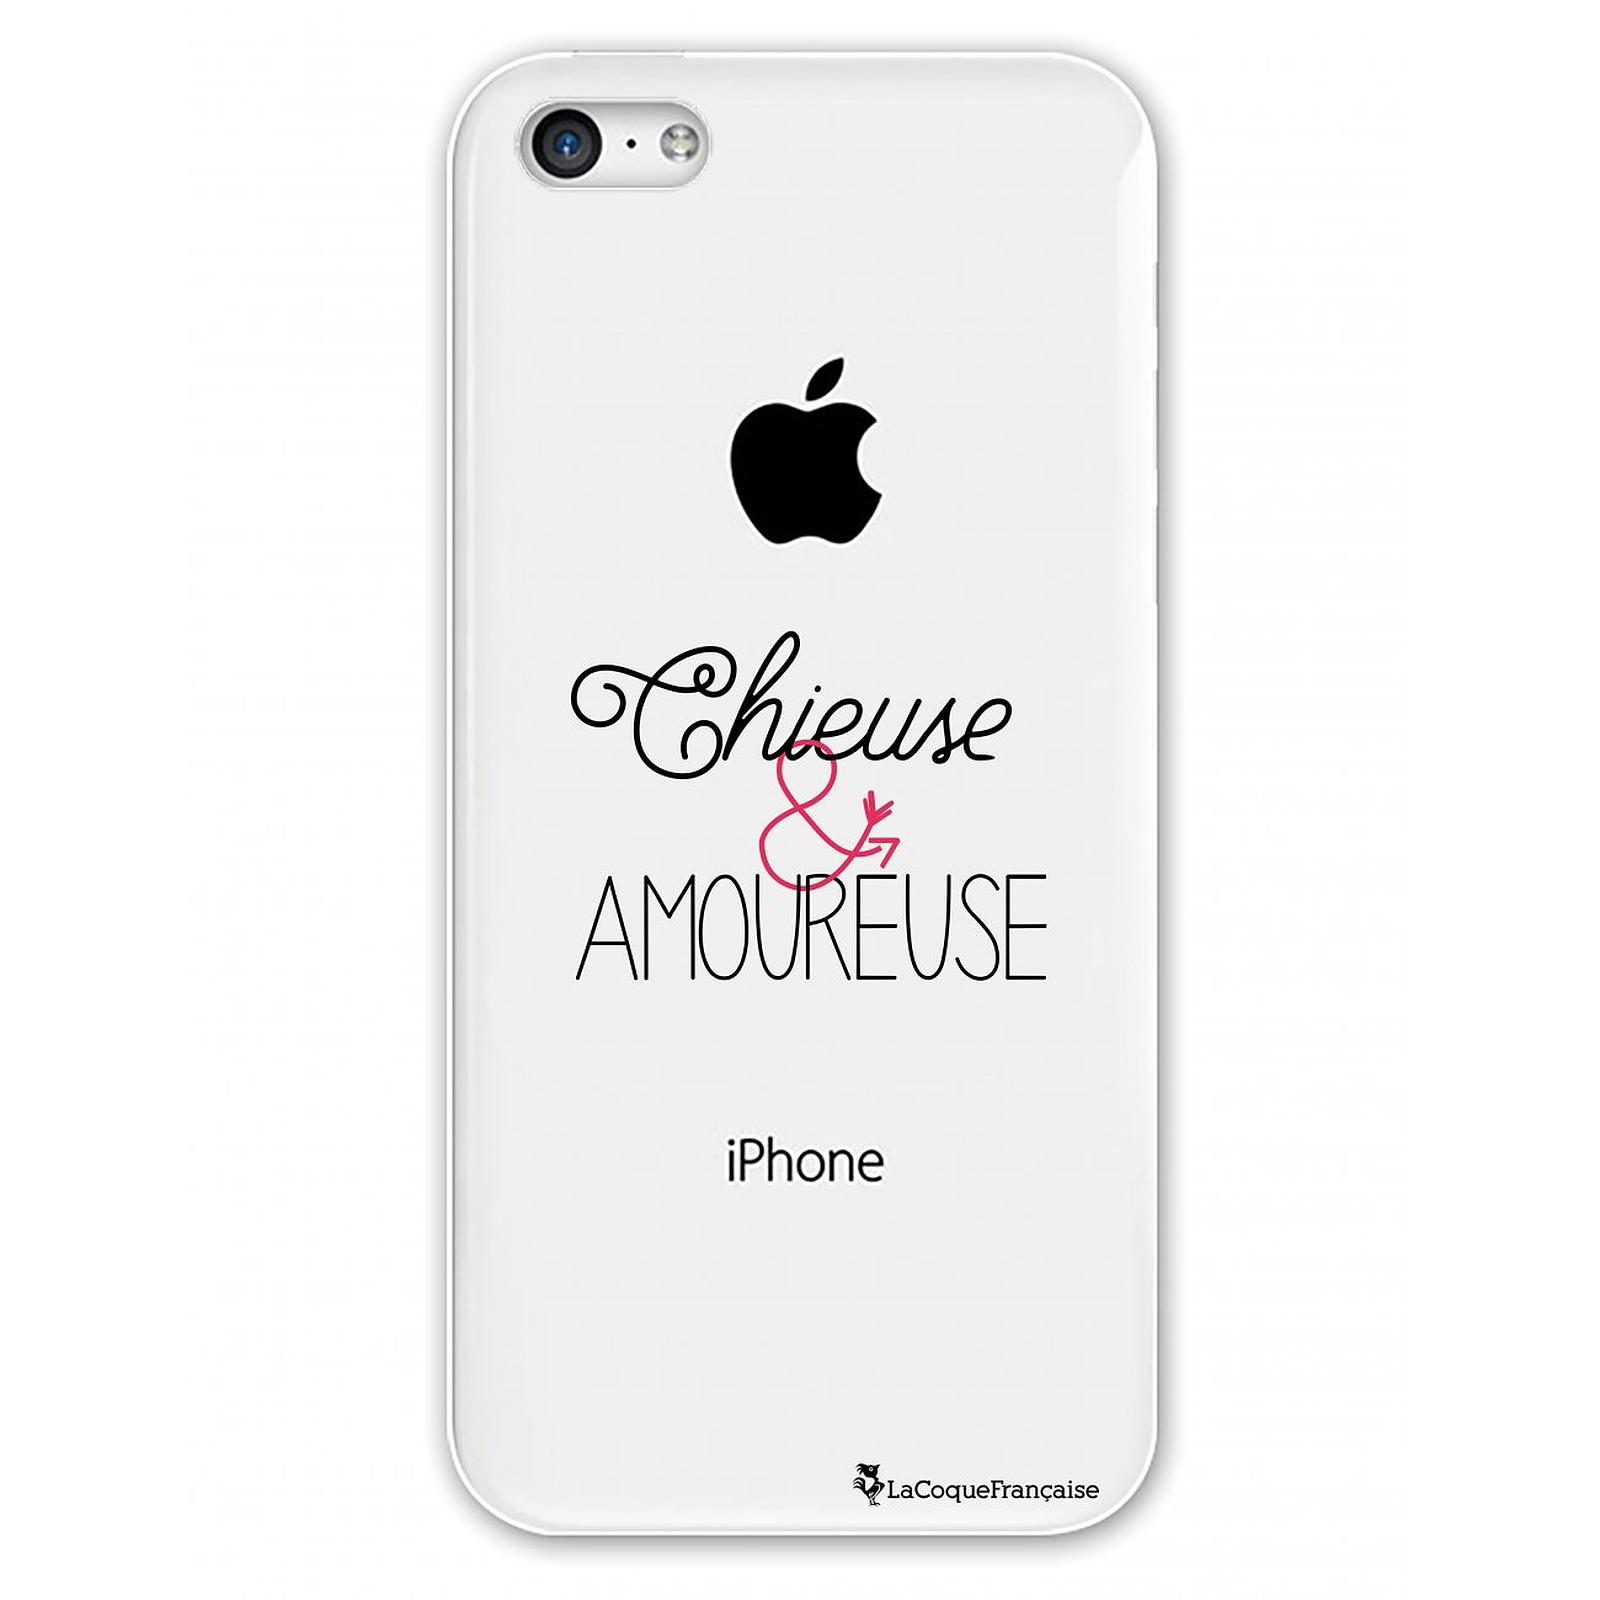 LA COQUE FRANCAISE Coque iPhone 5C rigide transparente Chieuse et Amoureuse Dessin